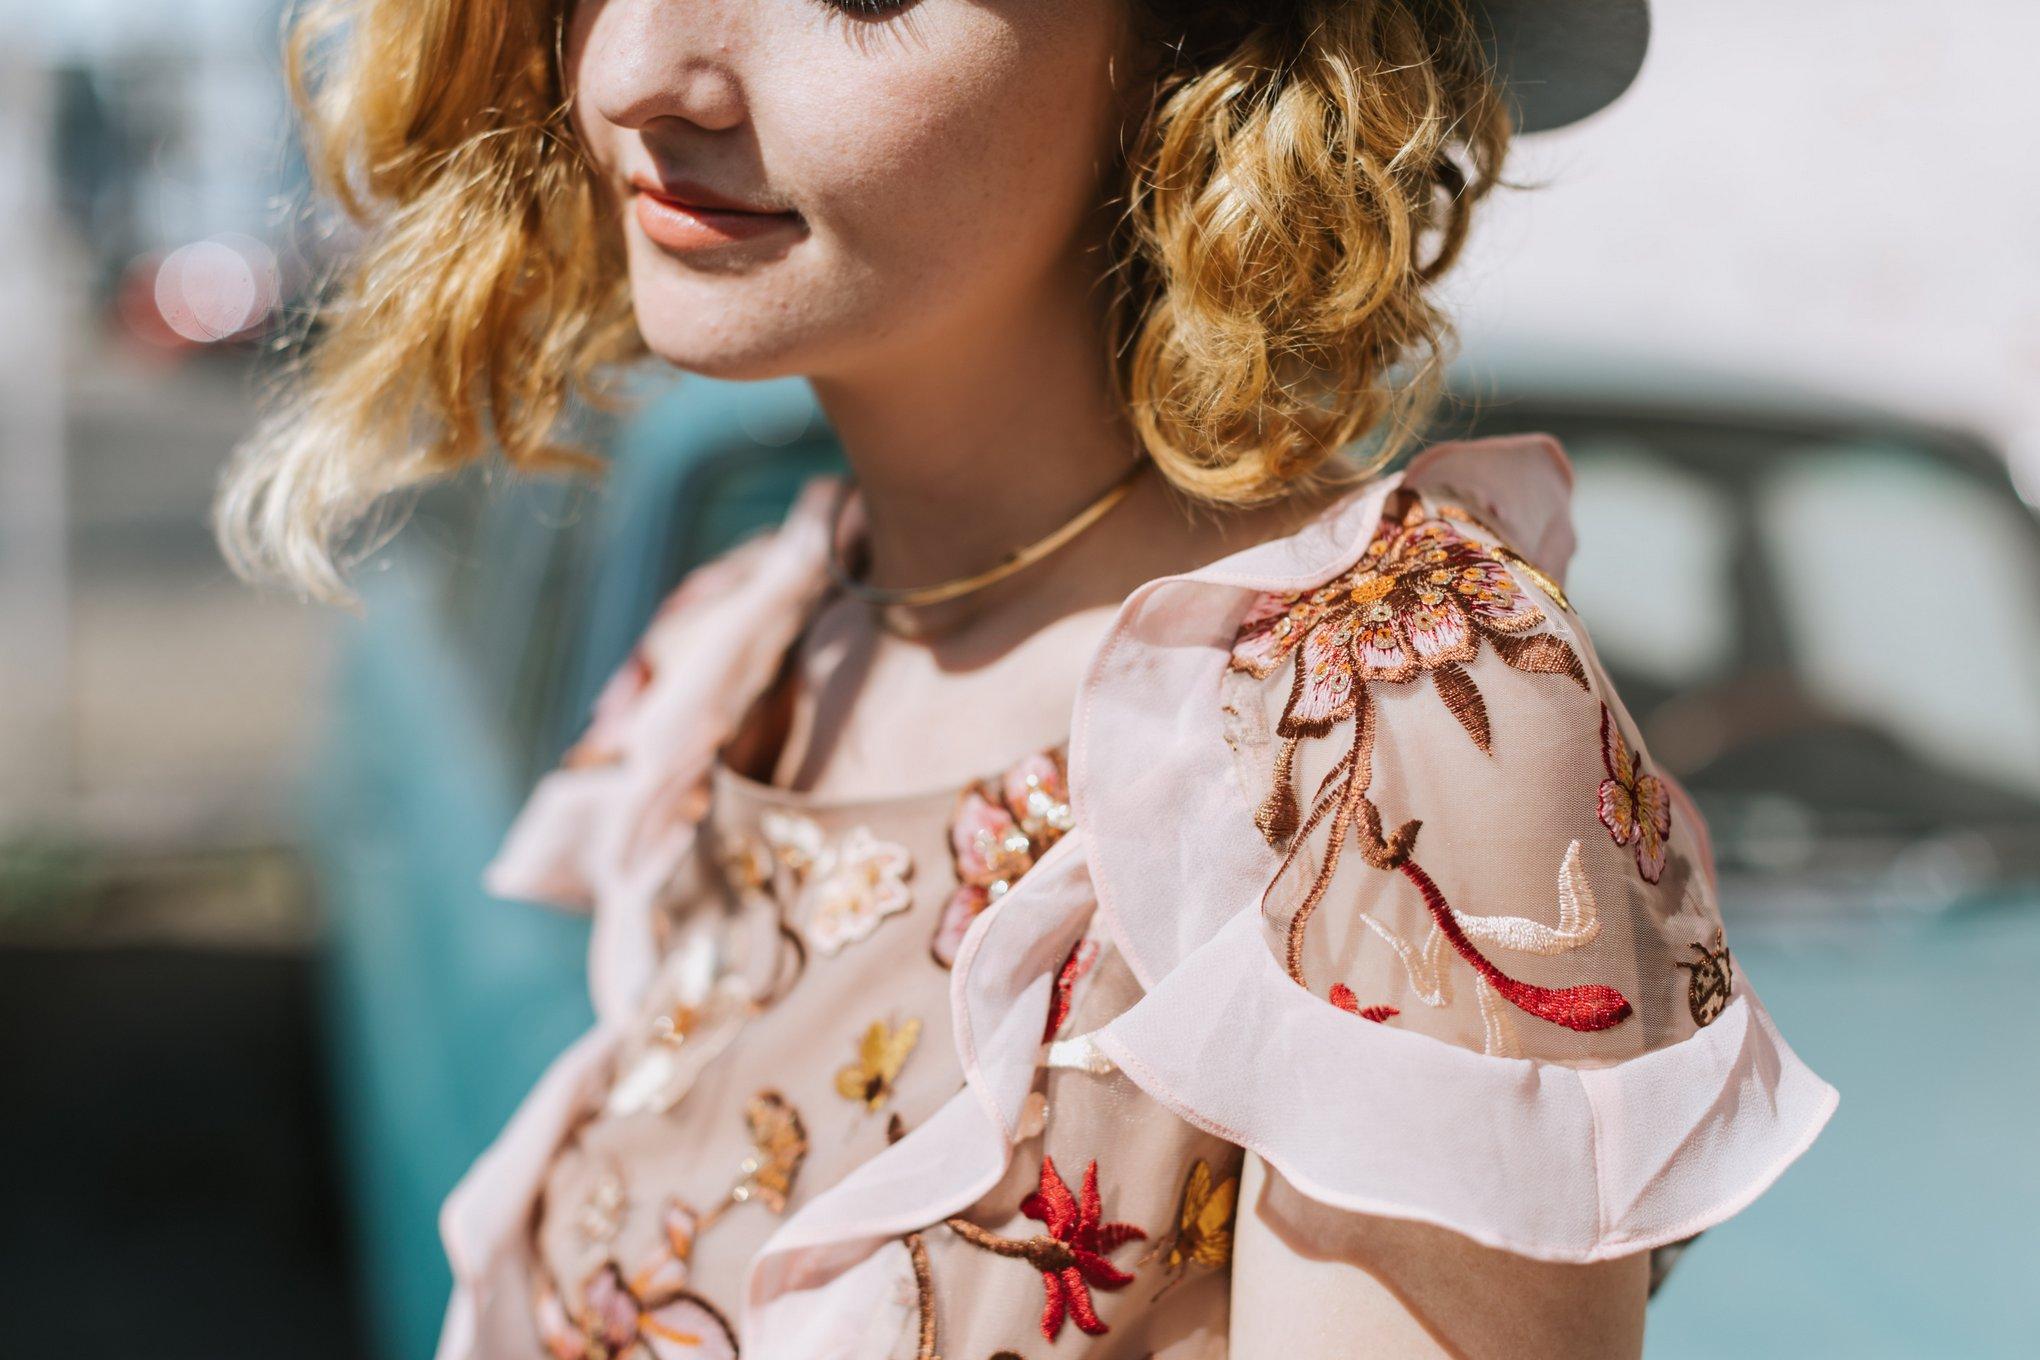 Boston_Fashion_Photographer_Lena_3.jpg